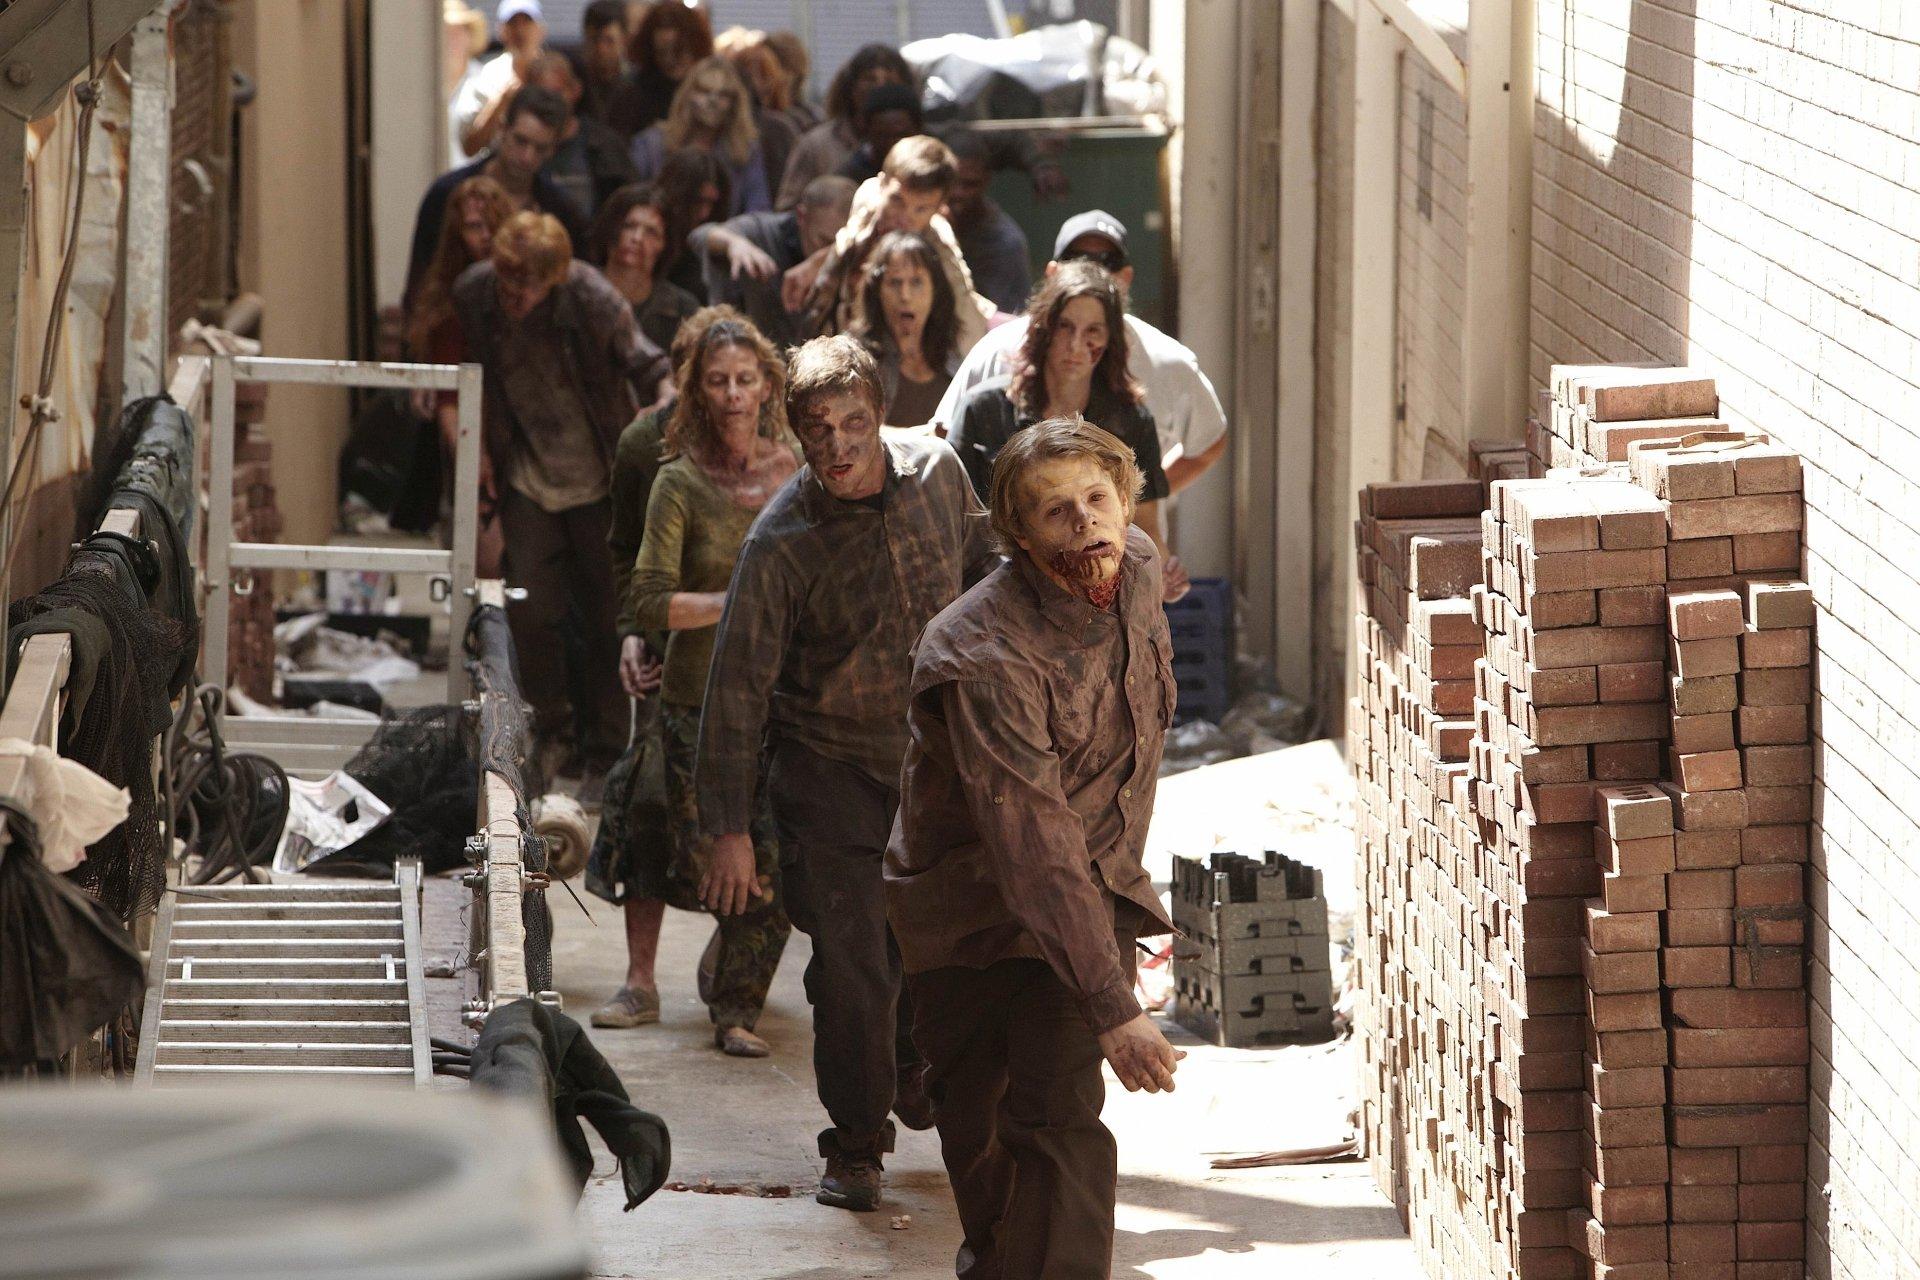 The Walking Dead Full Hd Fondo De Pantalla And Fondo De: The Walking Dead 4k Ultra HD Fondo De Pantalla And Fondo